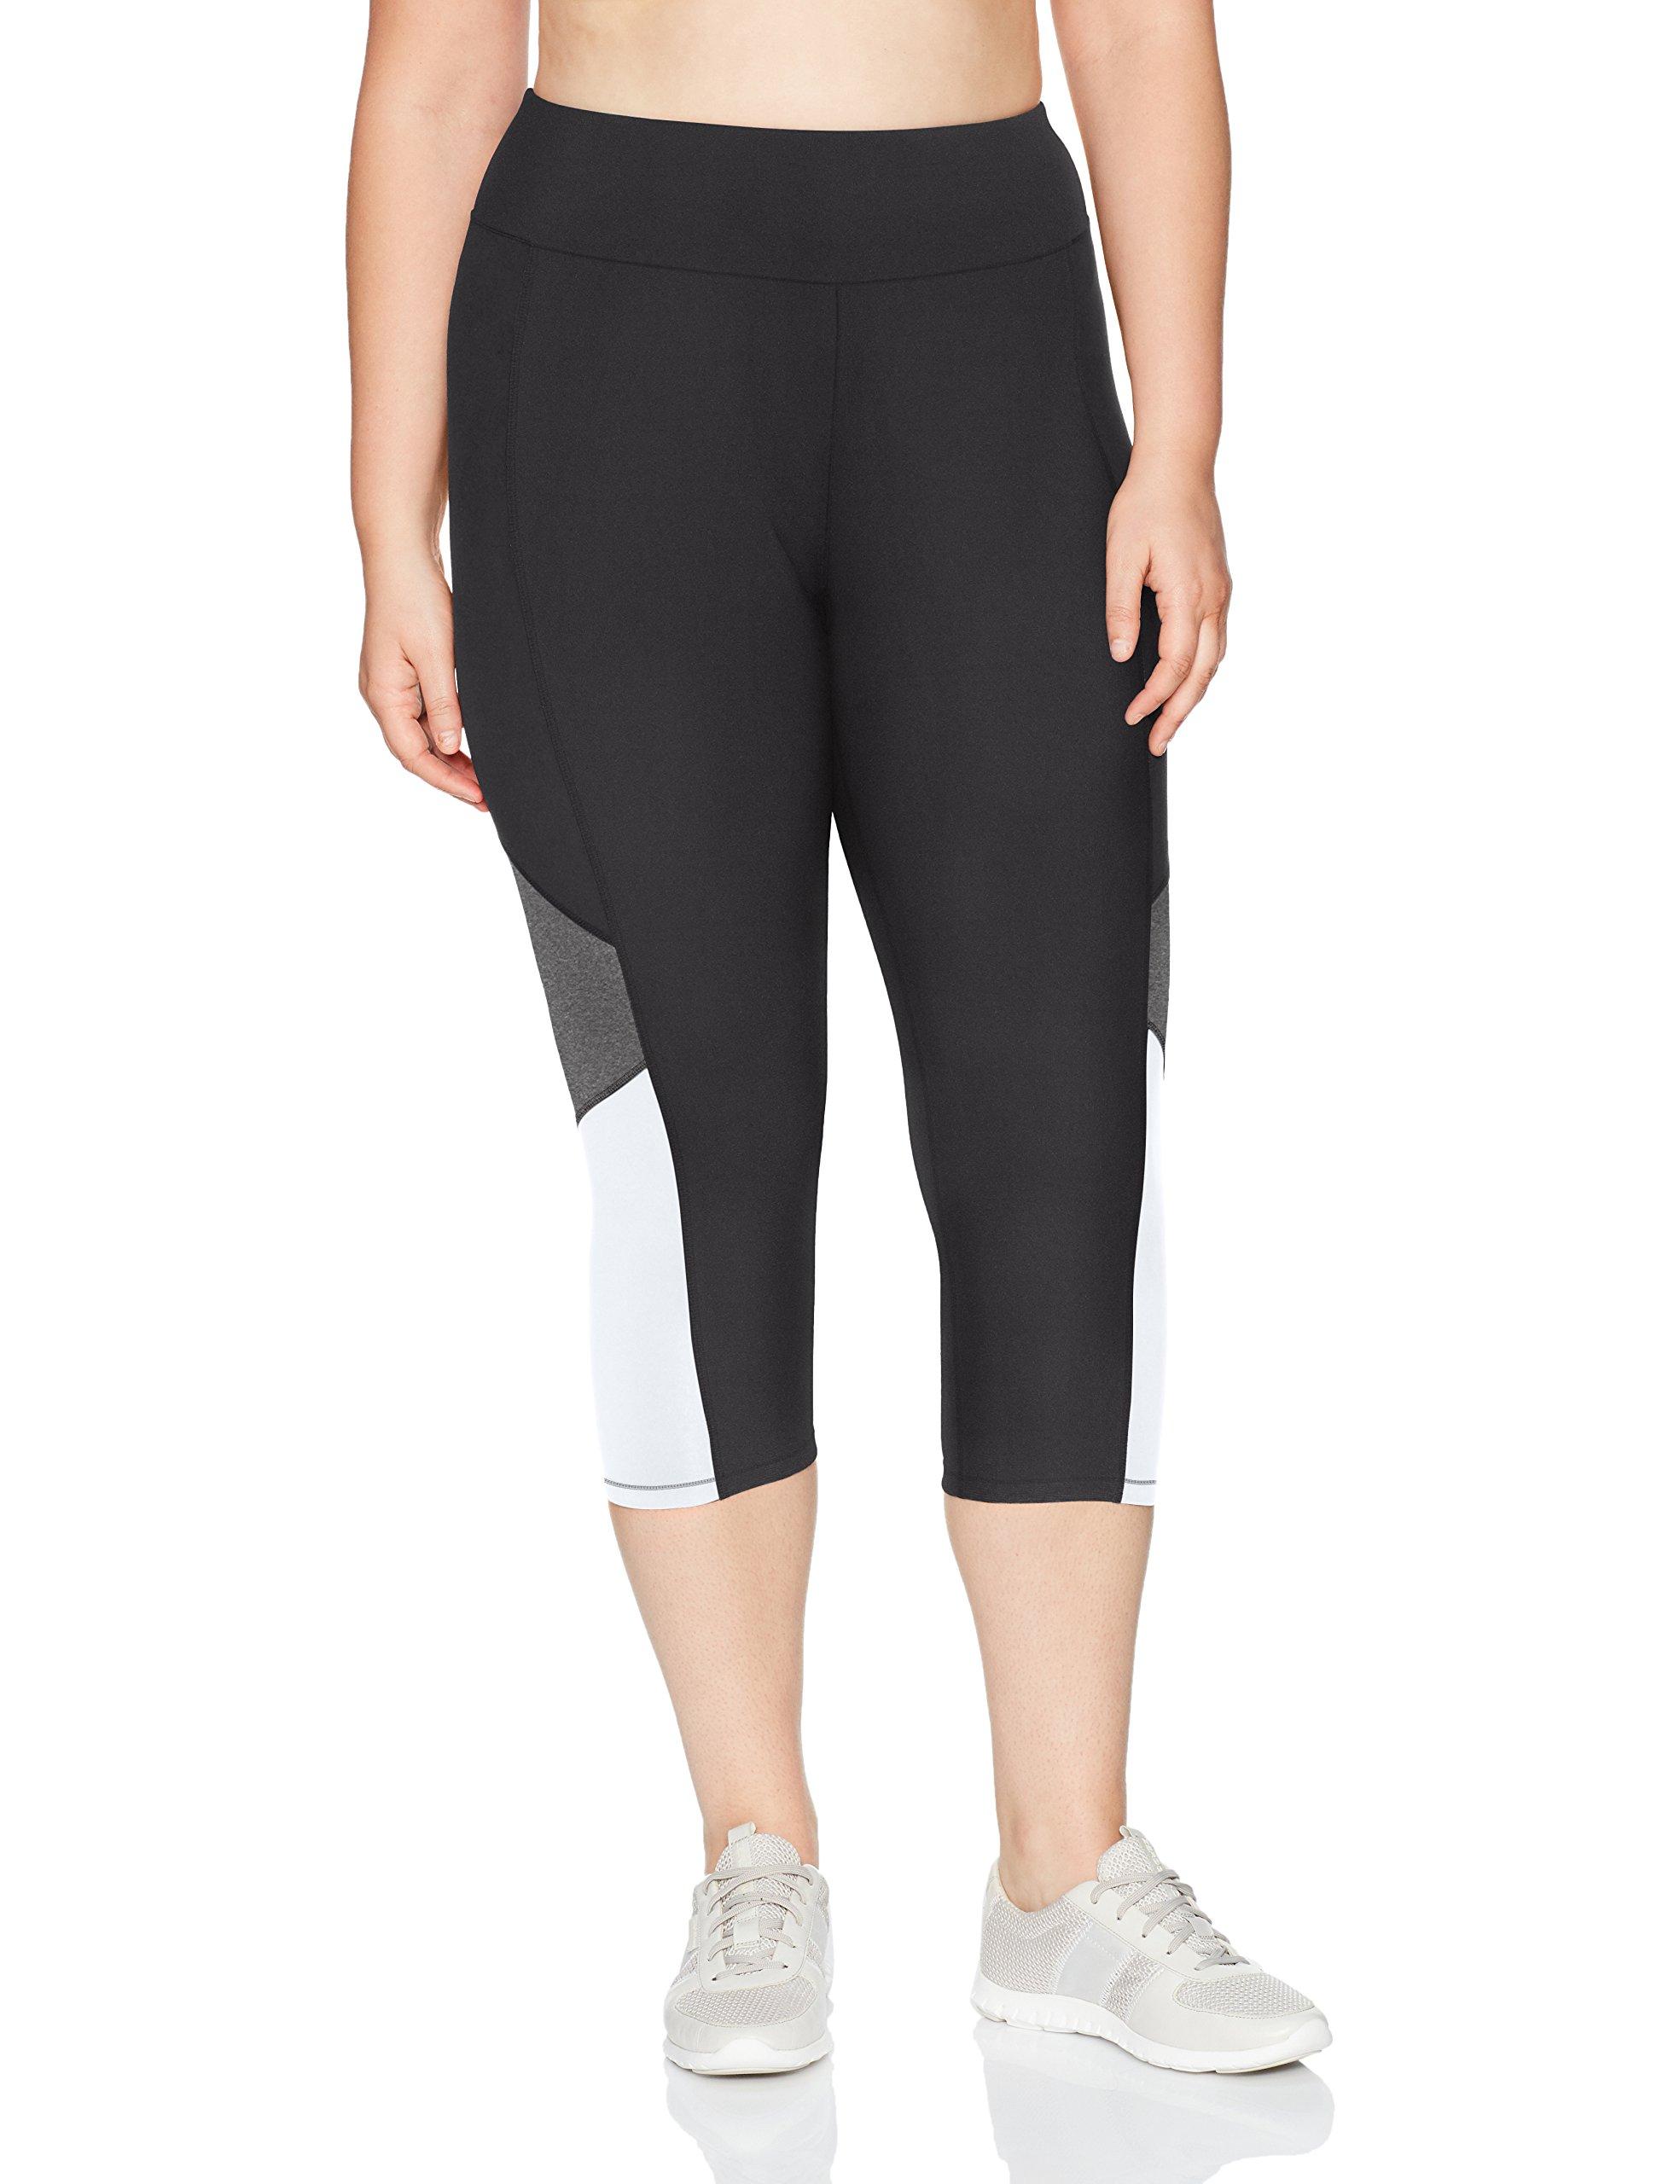 Just My Size Women's Plus Size Active Pieced Stretch Capri, Black/Granite Heather/White, 3X